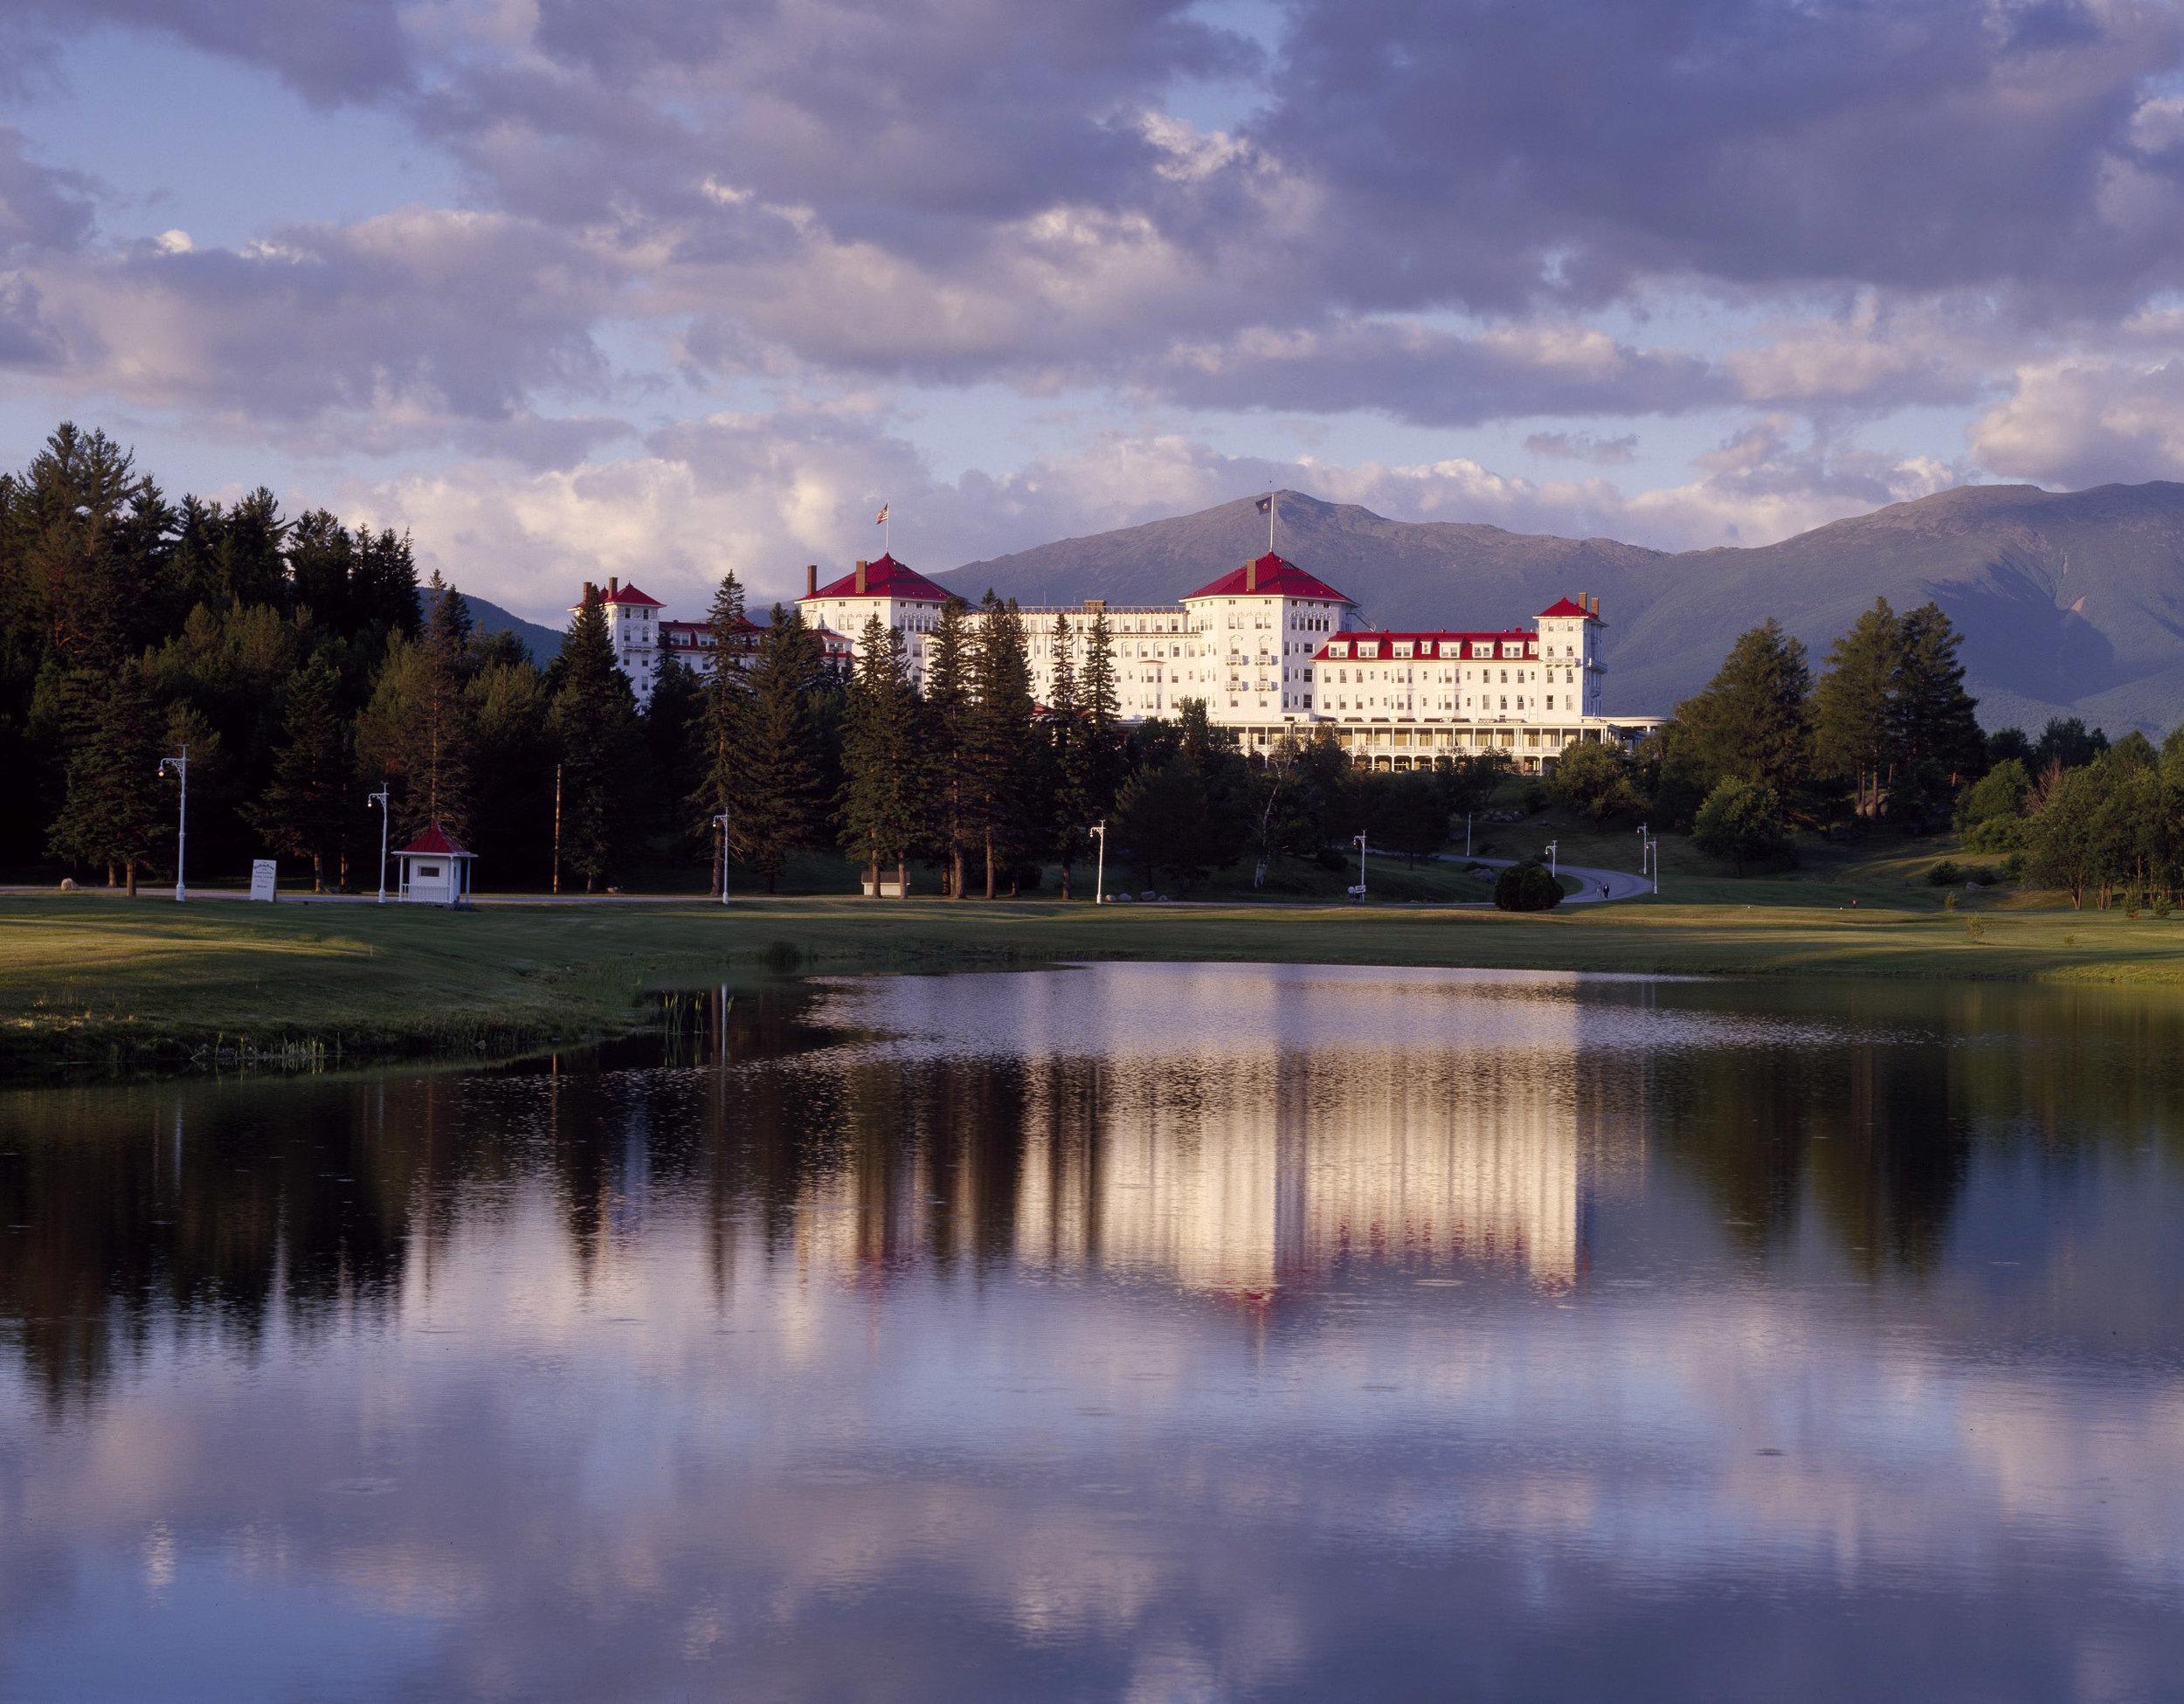 omni hotel mount washington.jpg